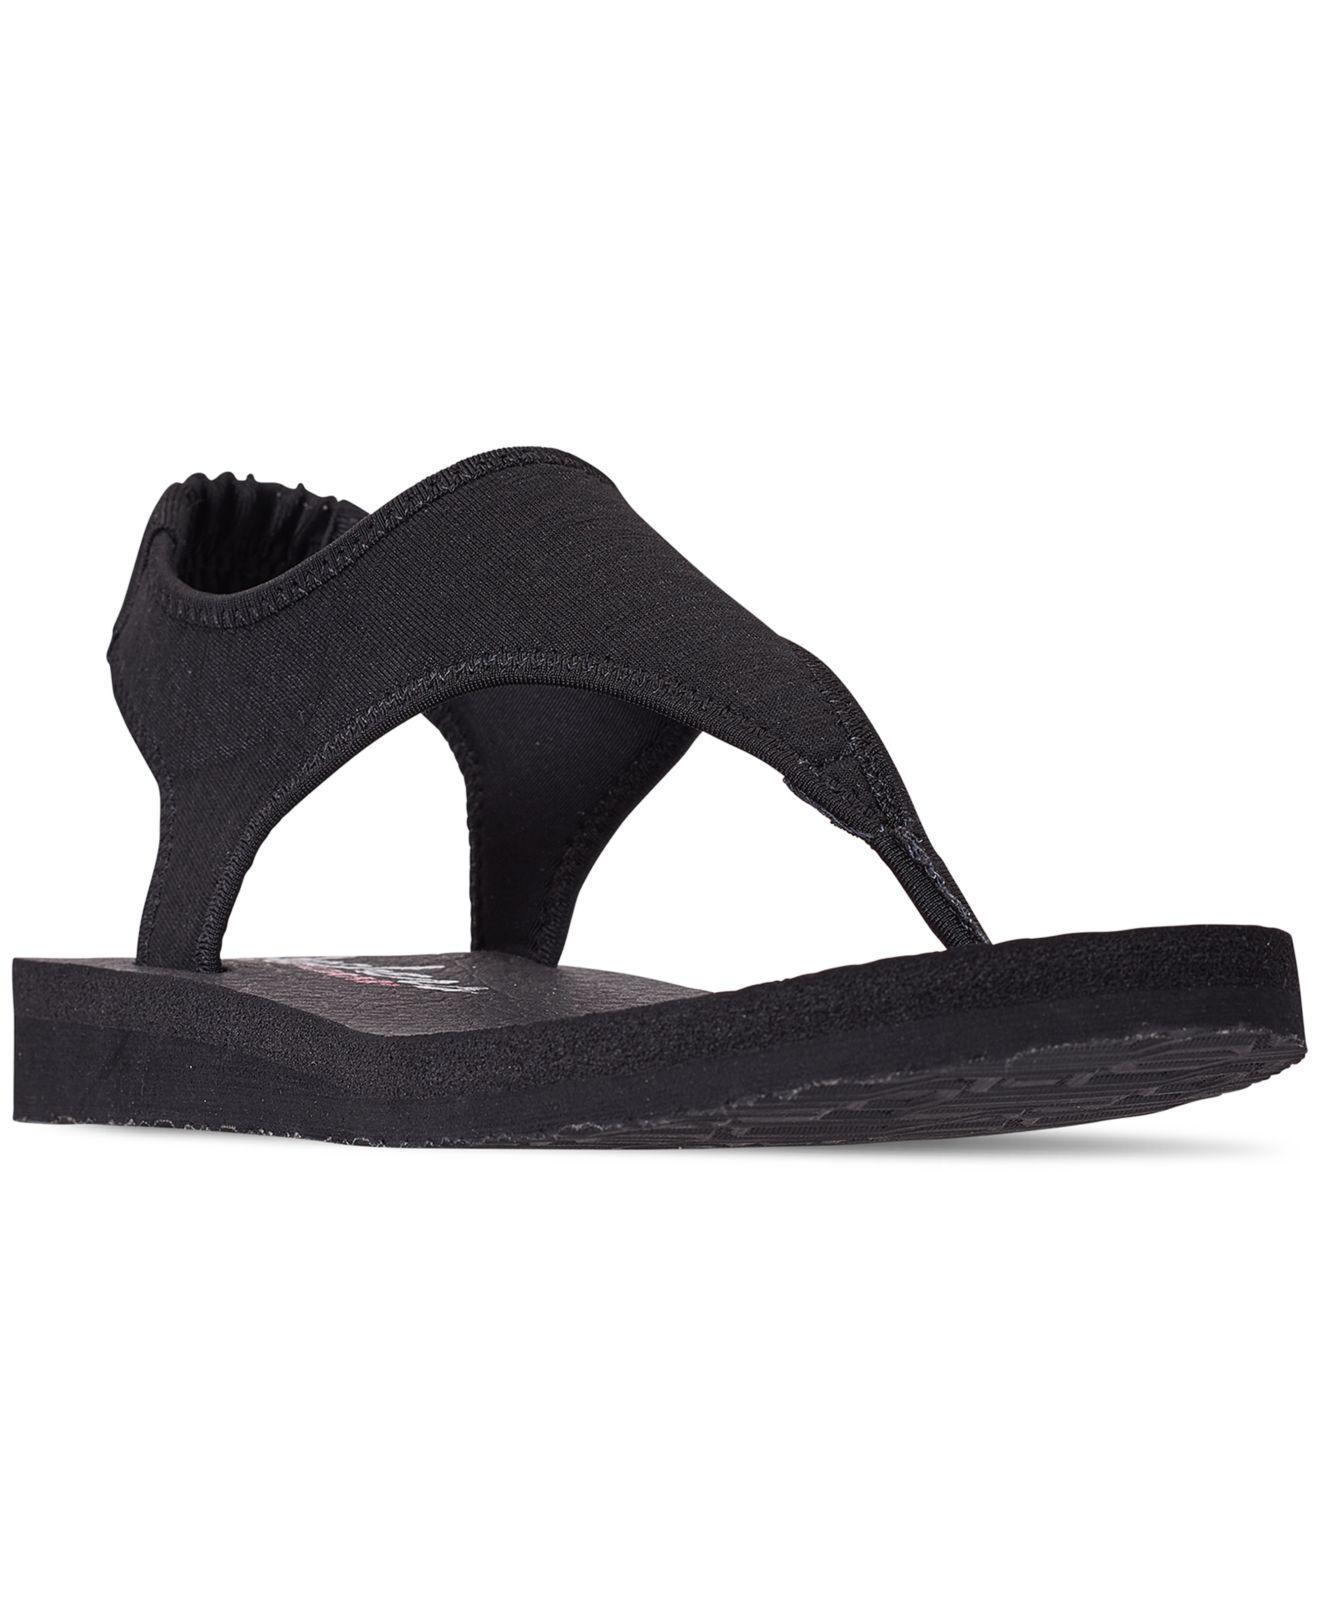 19f9db8c2 Skechers. Women s Black Asana - Twilight Spell Flip-flop Thong Sandals From Finish  Line